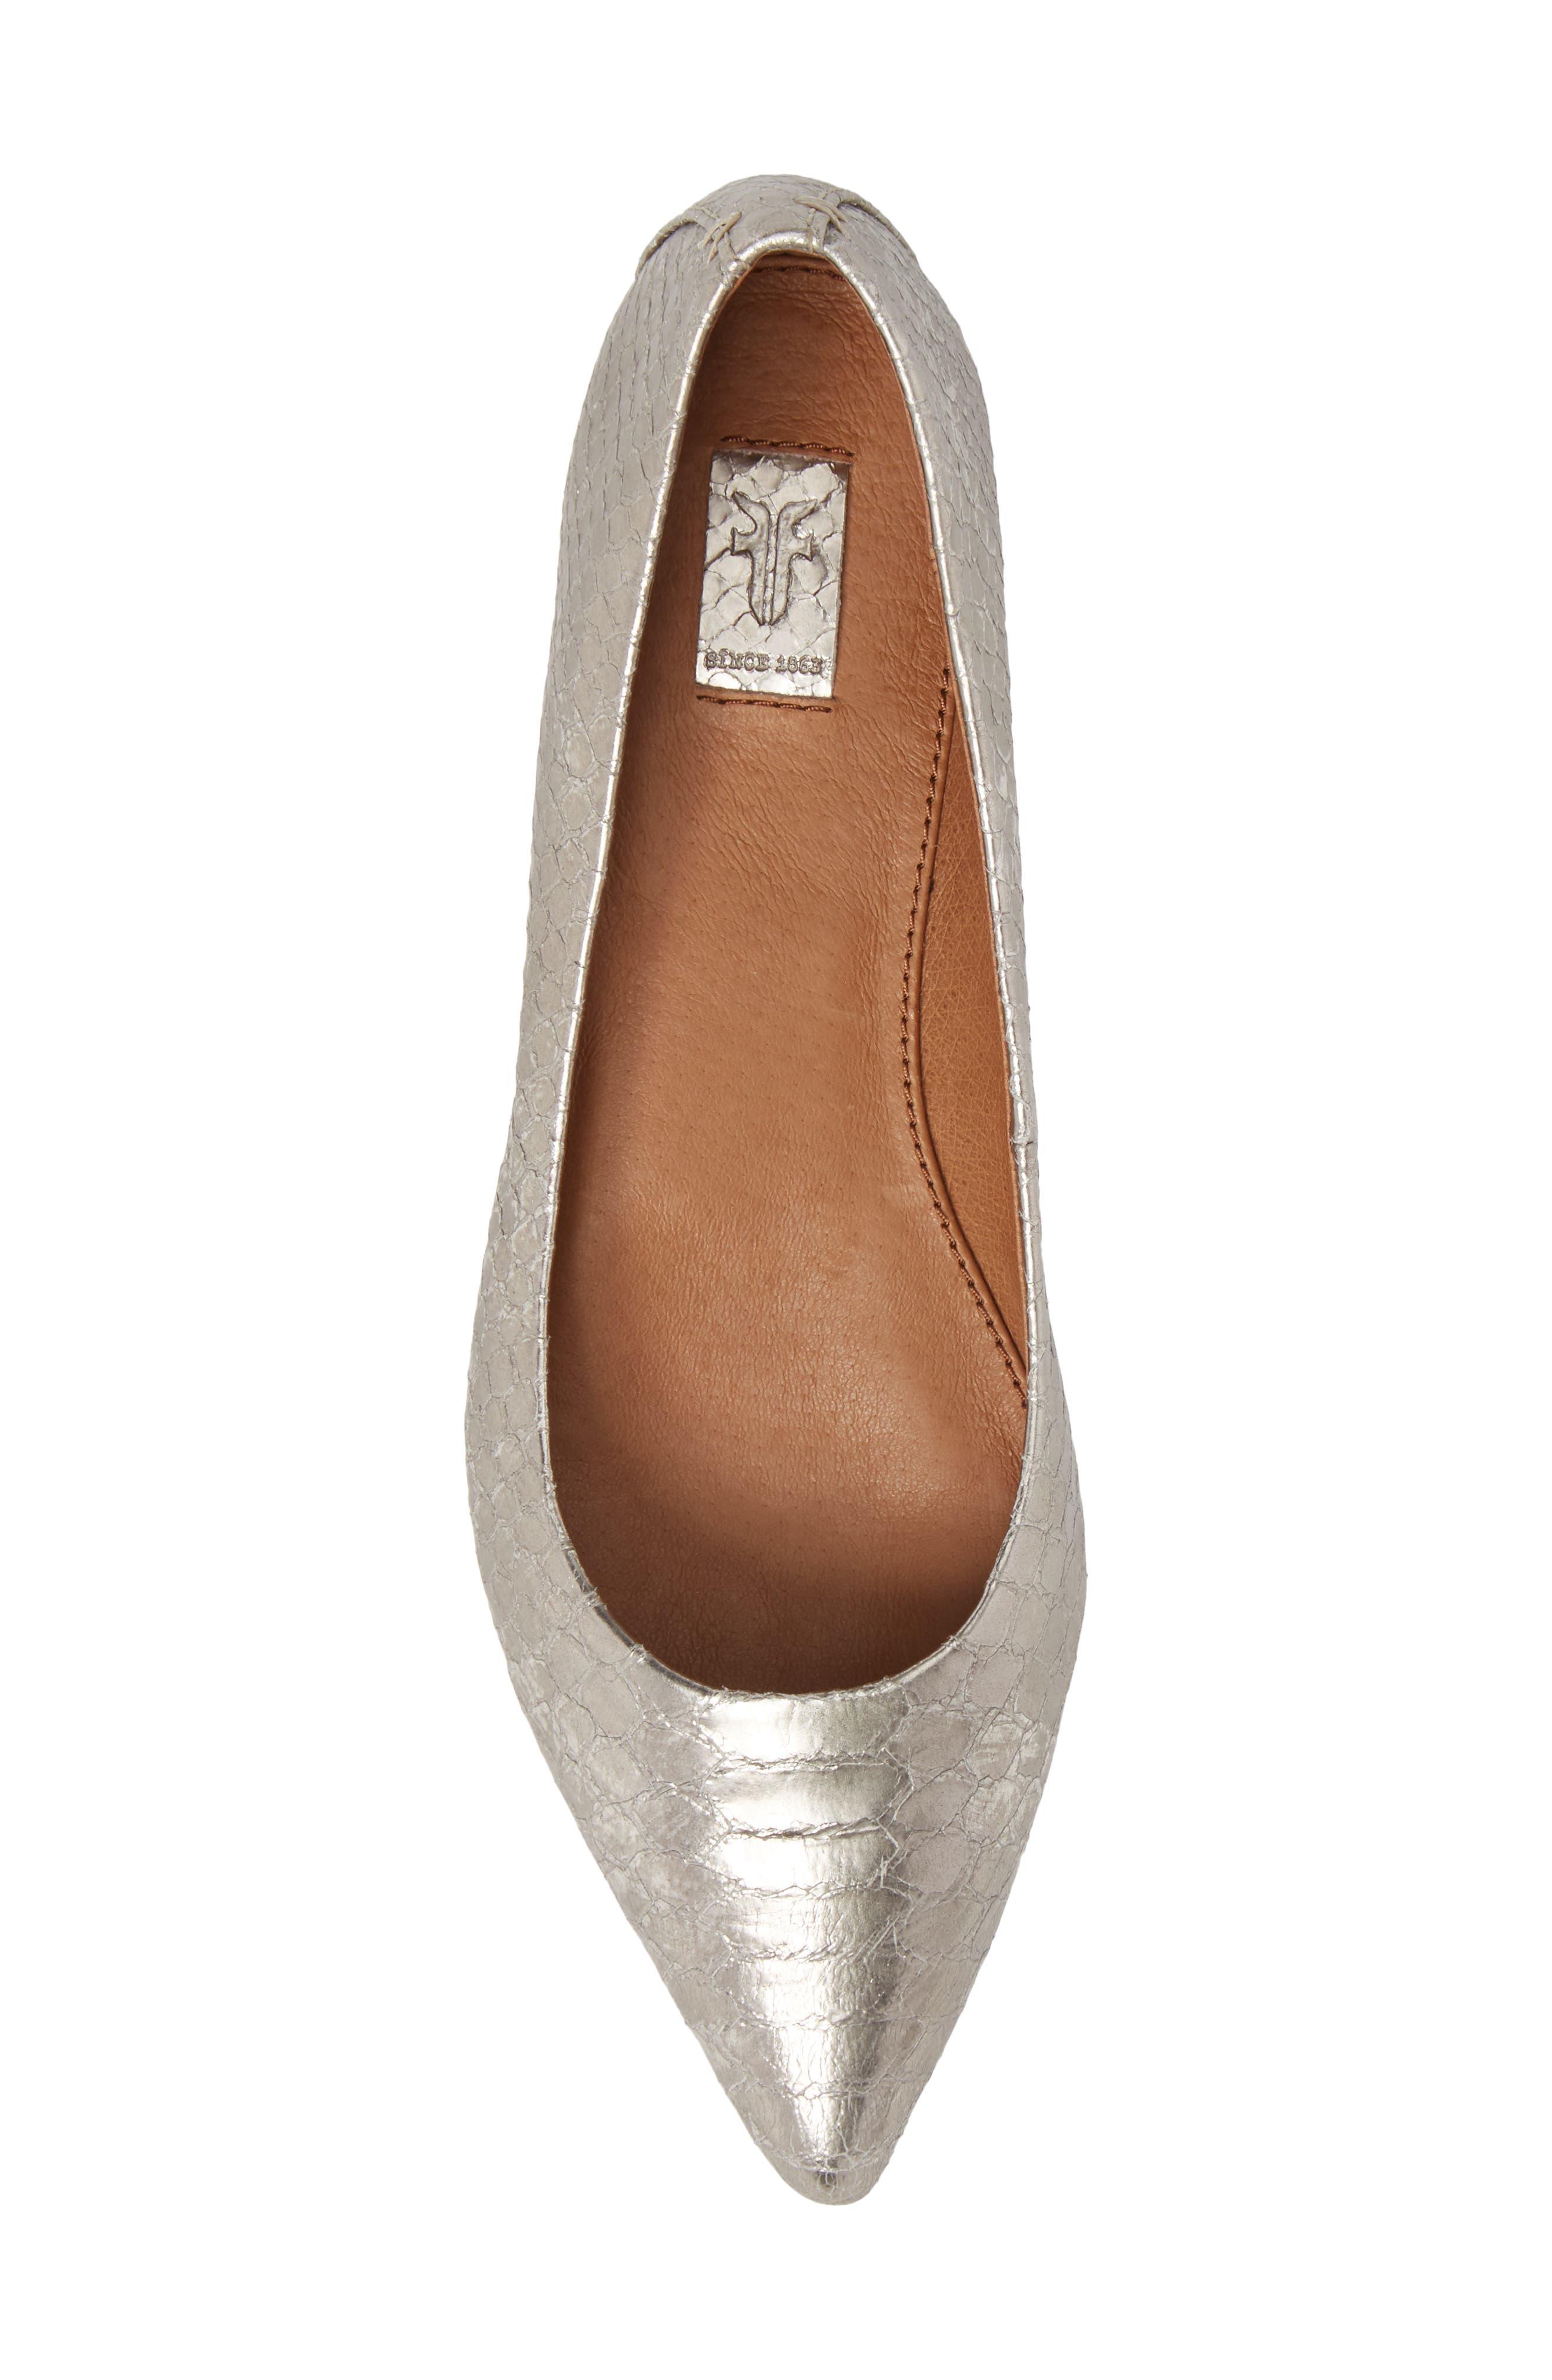 Sienna Pointy Toe Ballet Flat,                             Alternate thumbnail 5, color,                             040